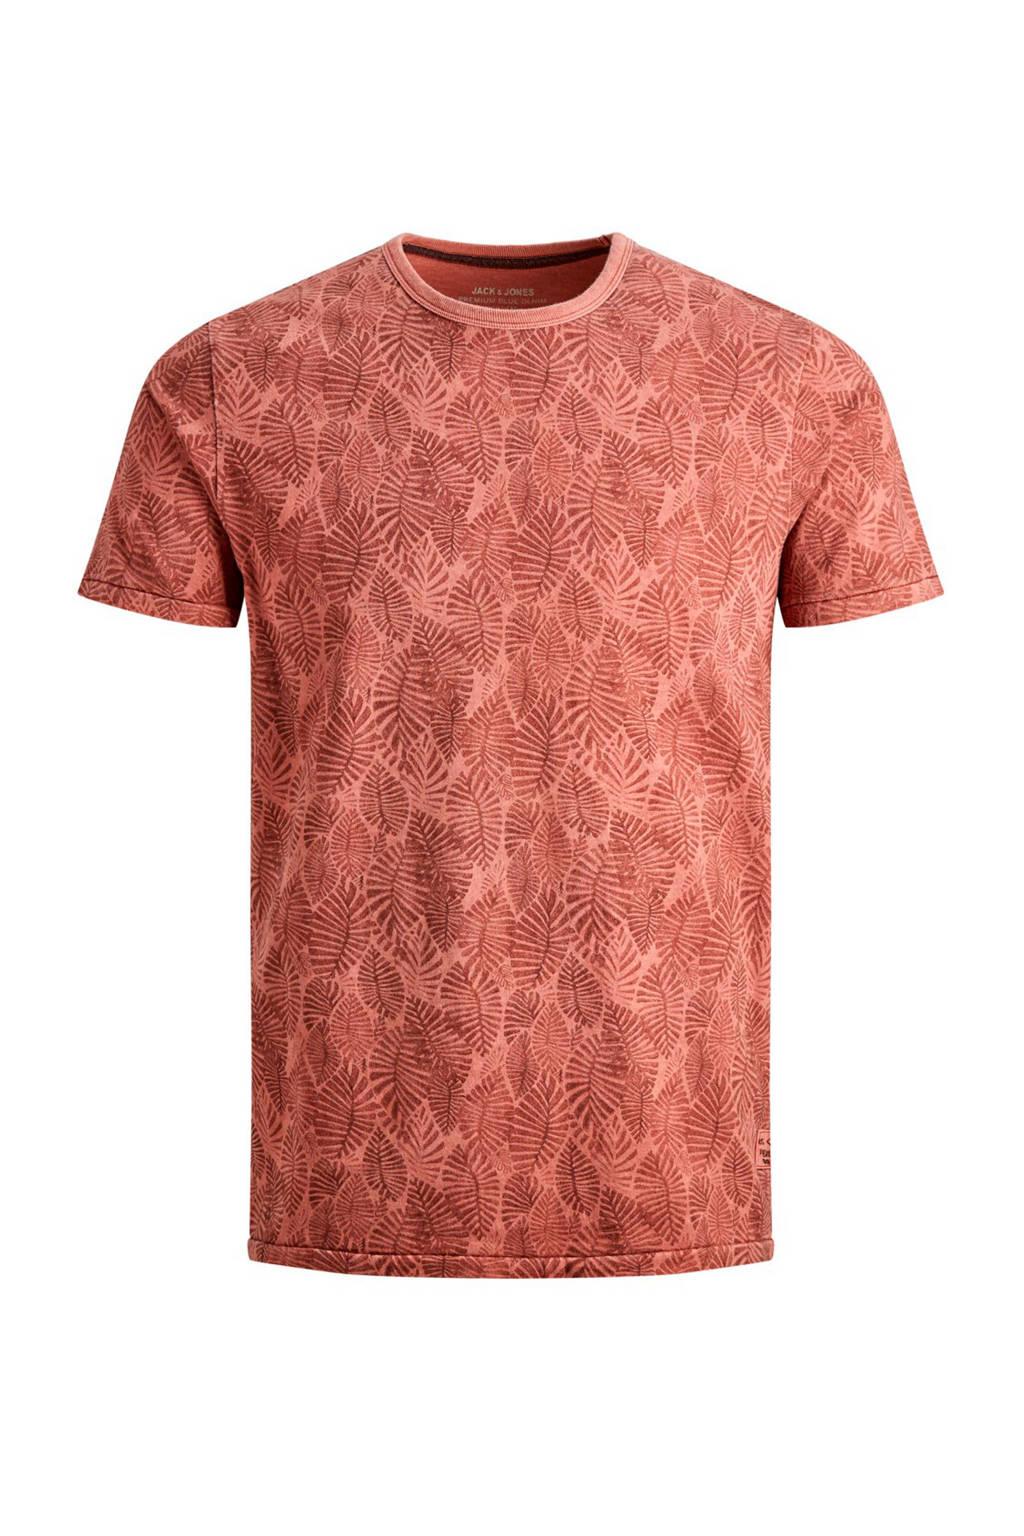 Jack & Jones Premium slim fit T-shirt met all over print, Rood